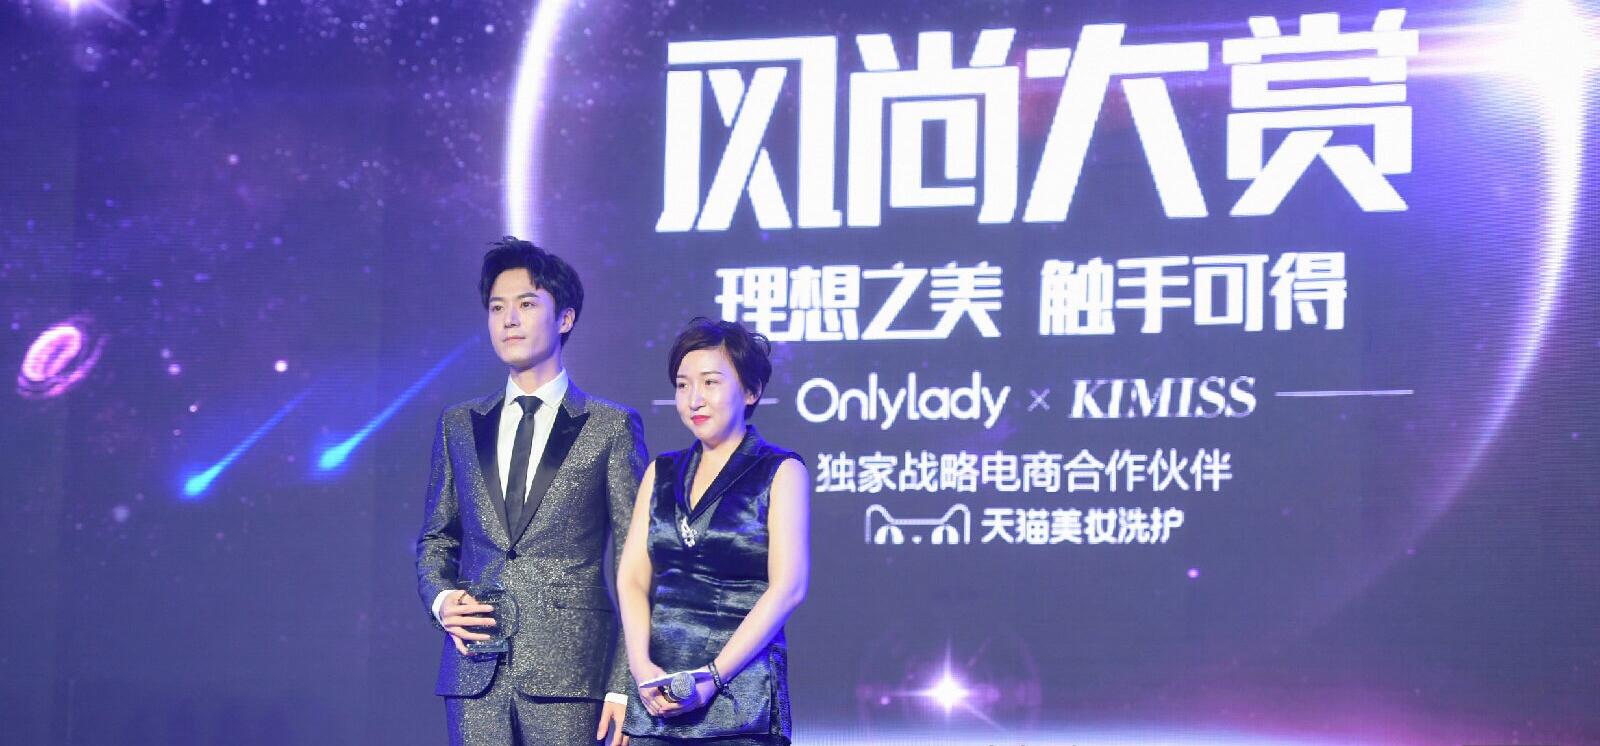 OnlyLady副总裁叶以婷女士为人气男演员获得者茅子俊颁奖